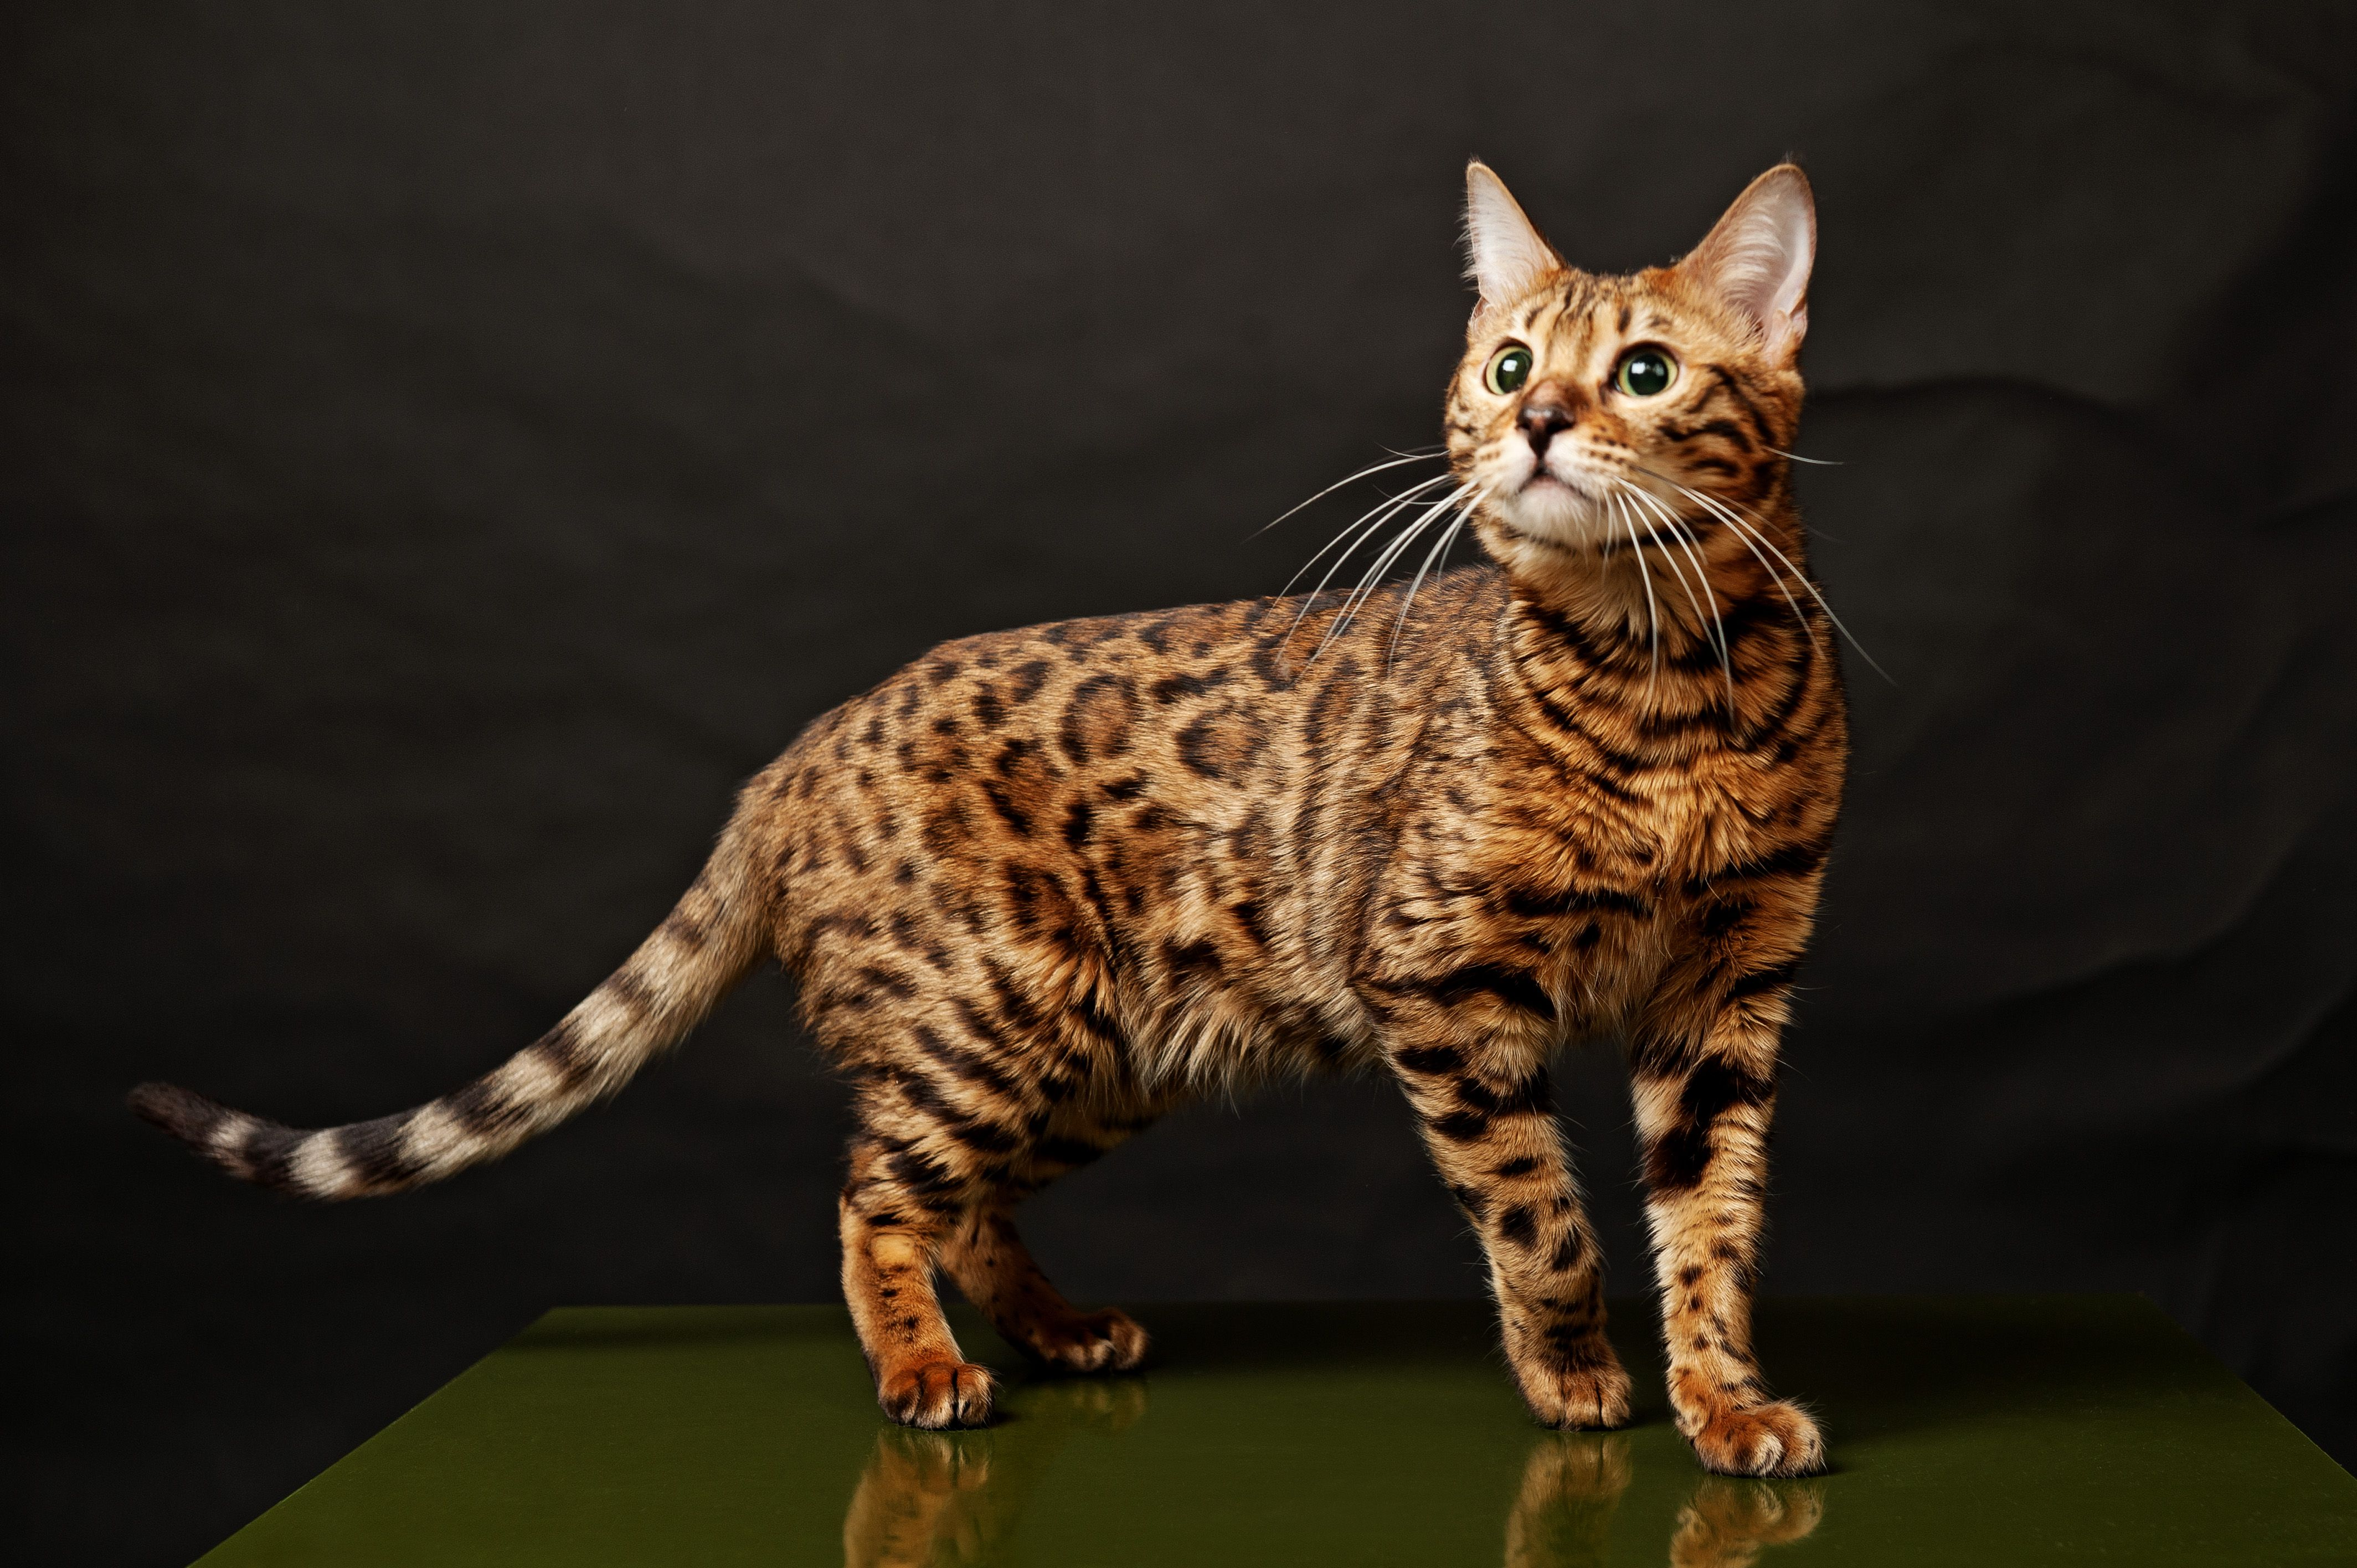 bengal cat size Google Search Bengal cat breeders, Cat